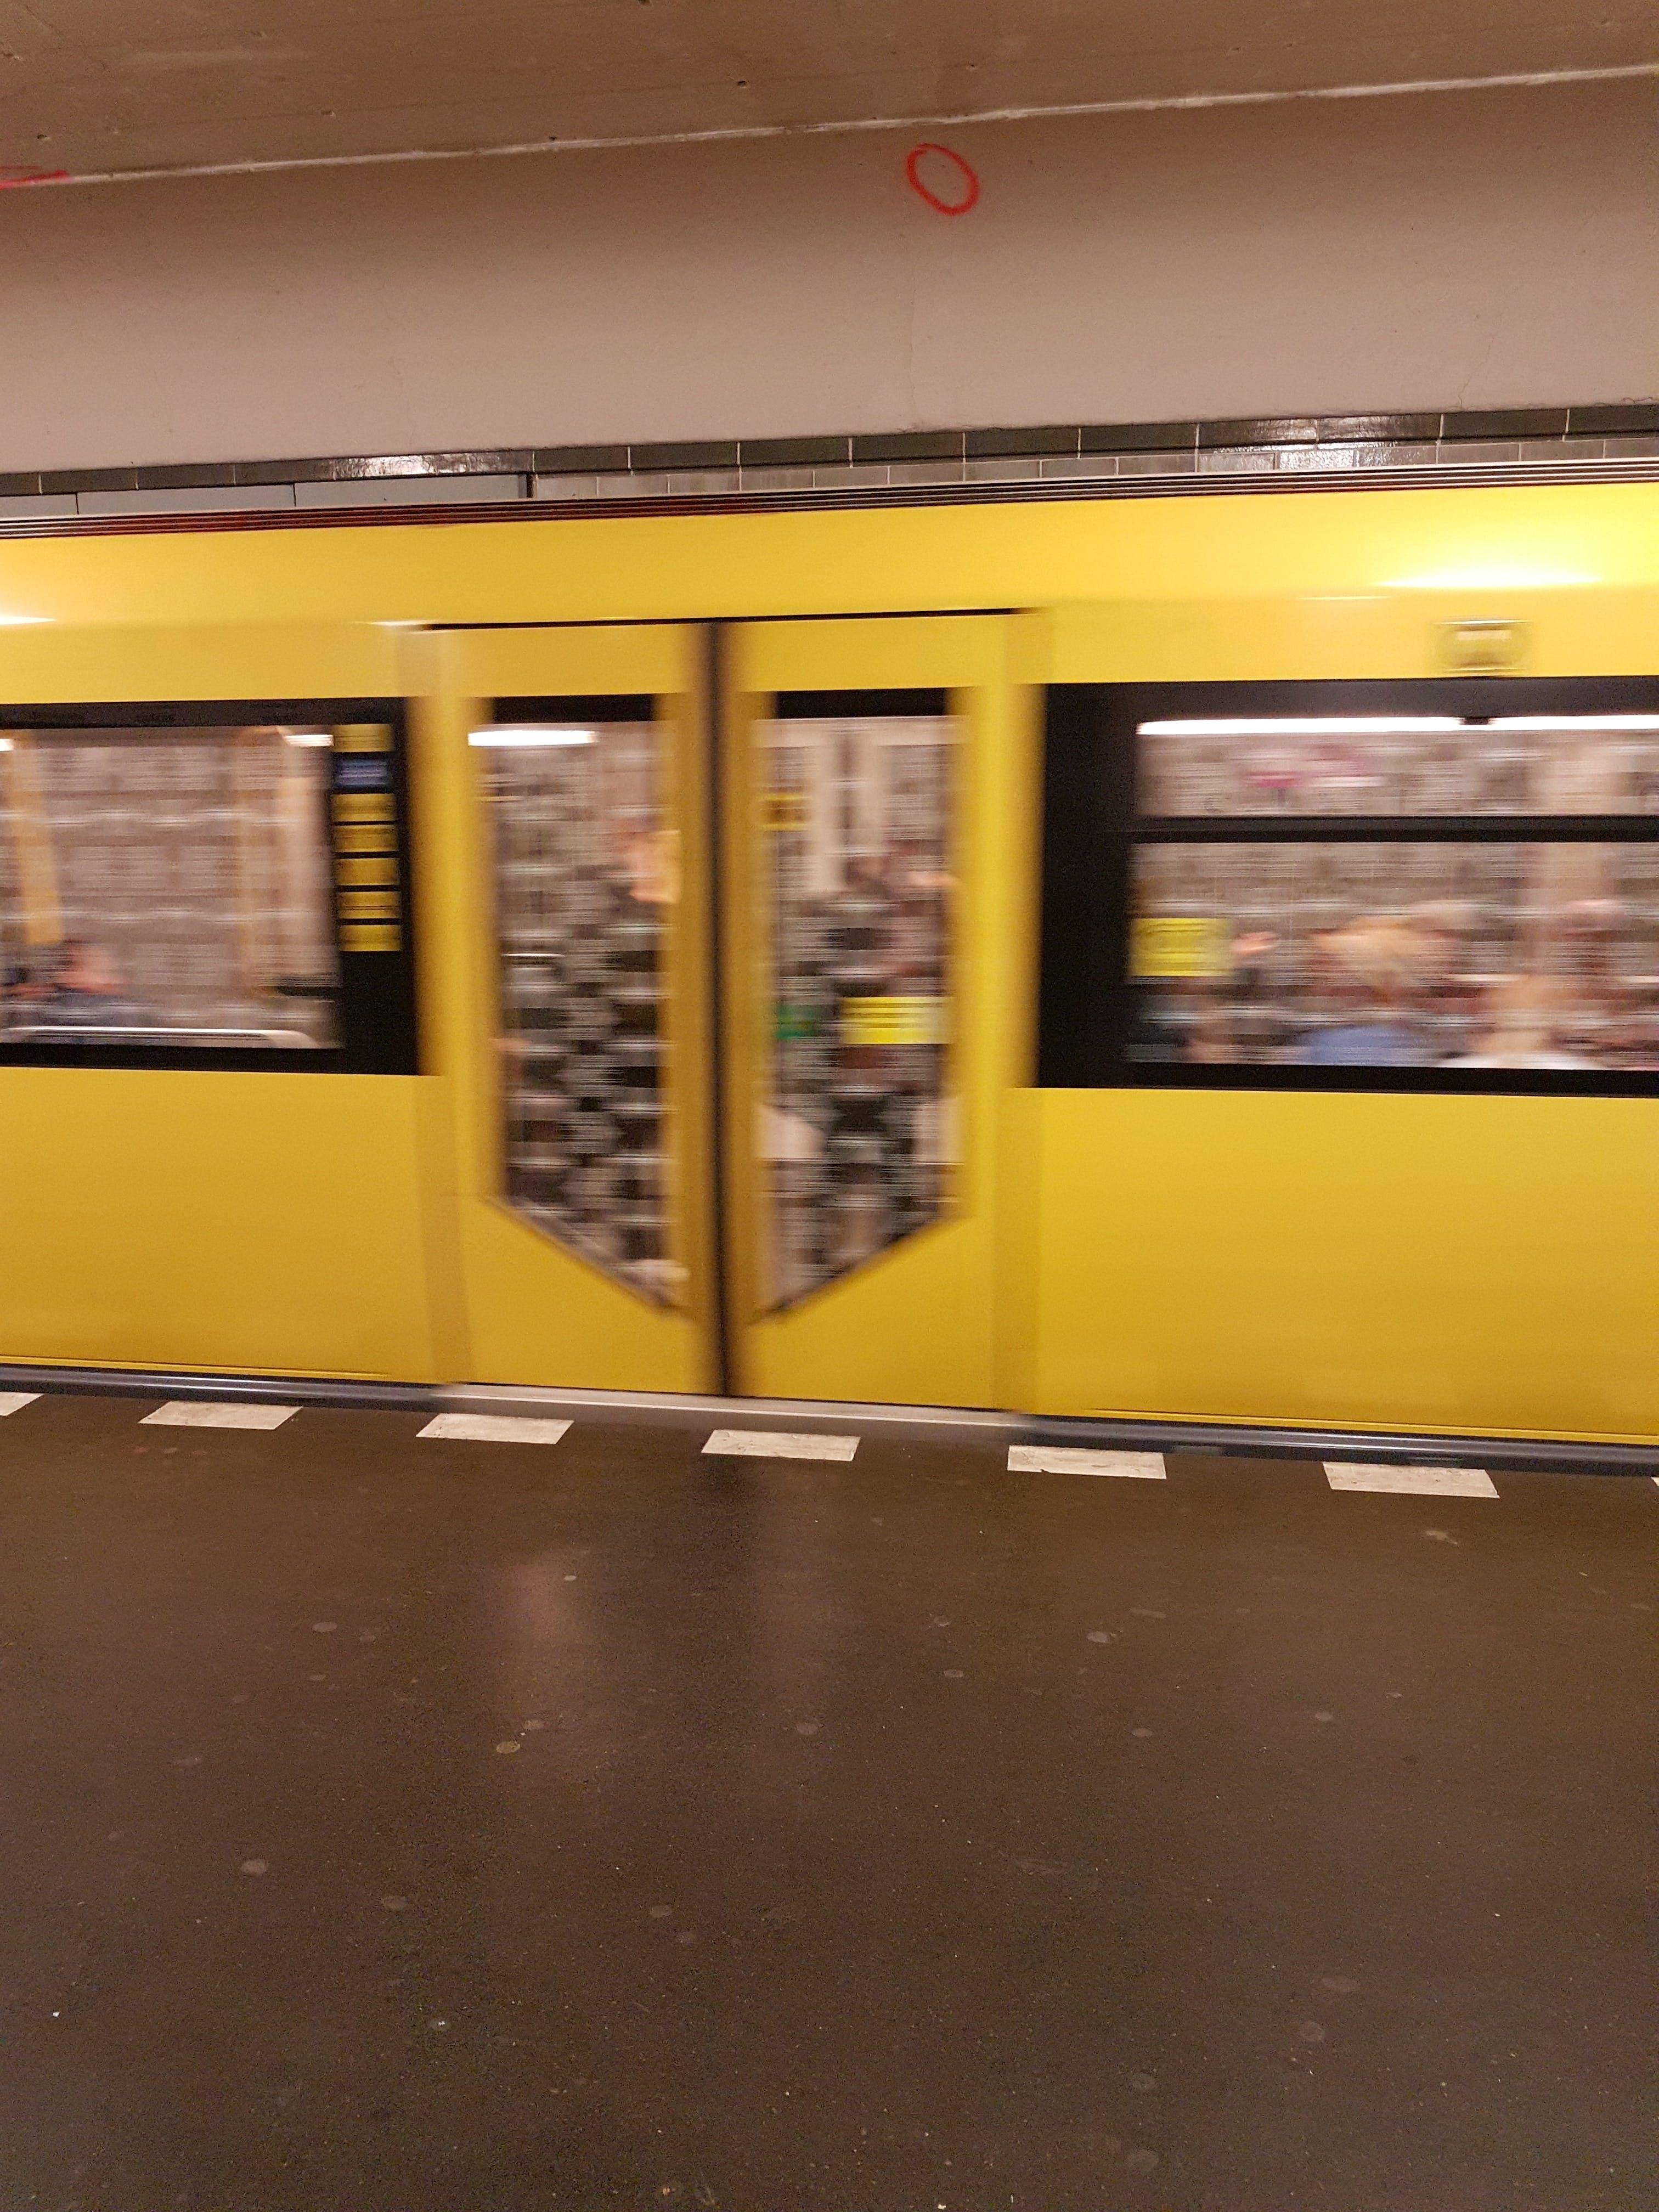 locomotive, public transport, public transportation